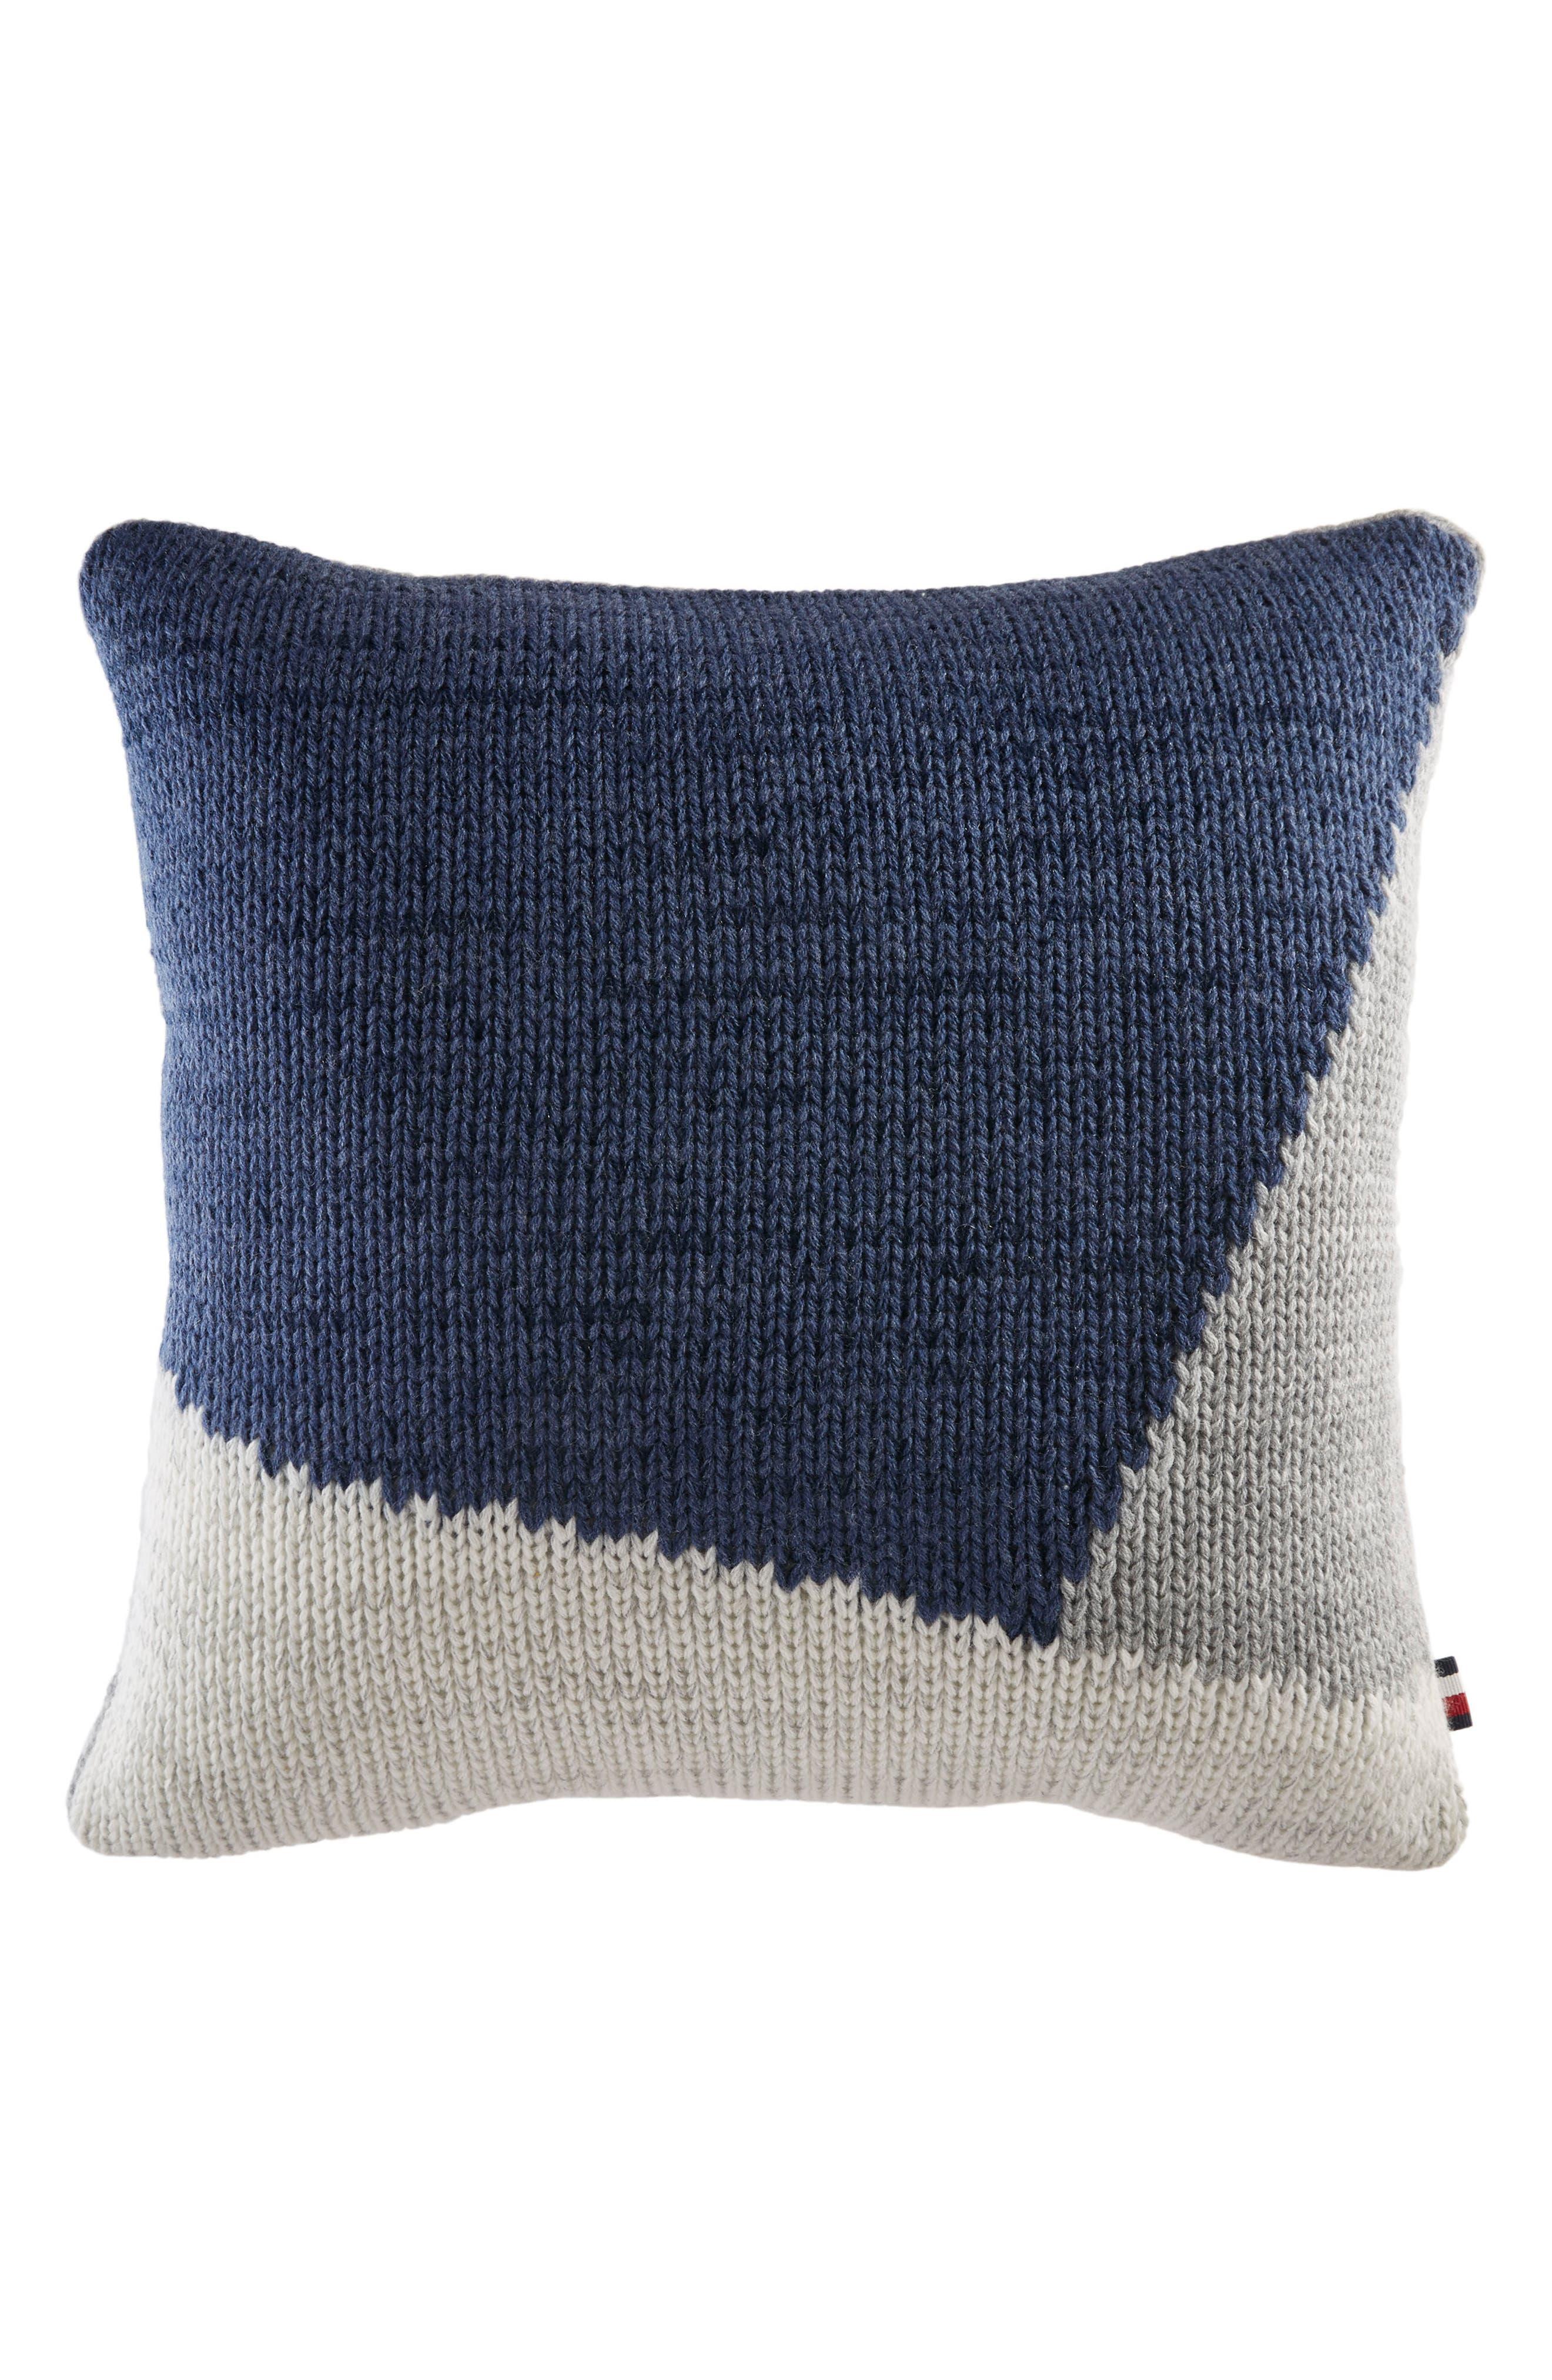 Colorblock Knit Accent Pillow,                         Main,                         color, Blue/ Grey Multi